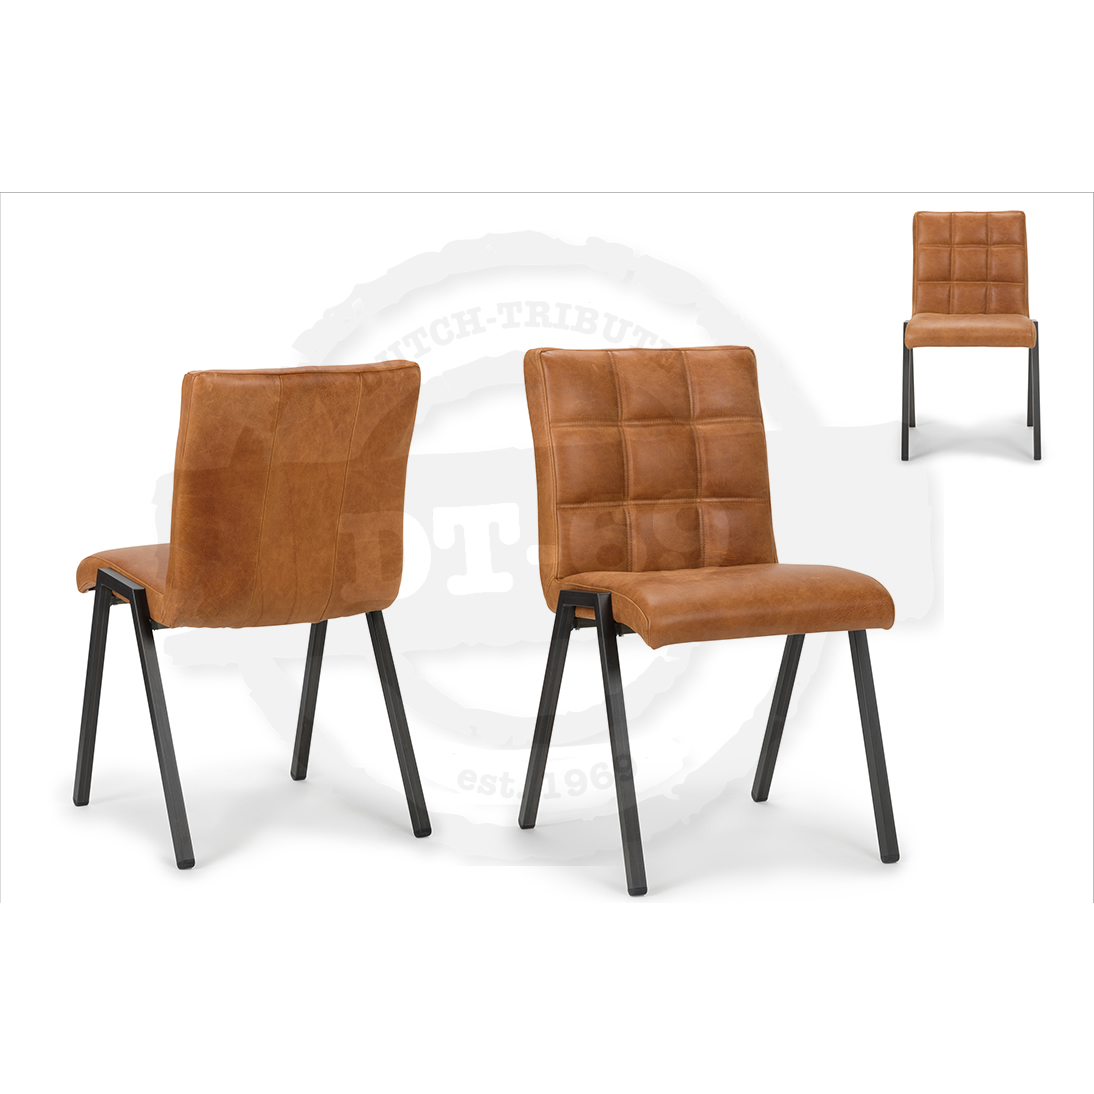 Industriële stoel Check - zonder armleuning S005